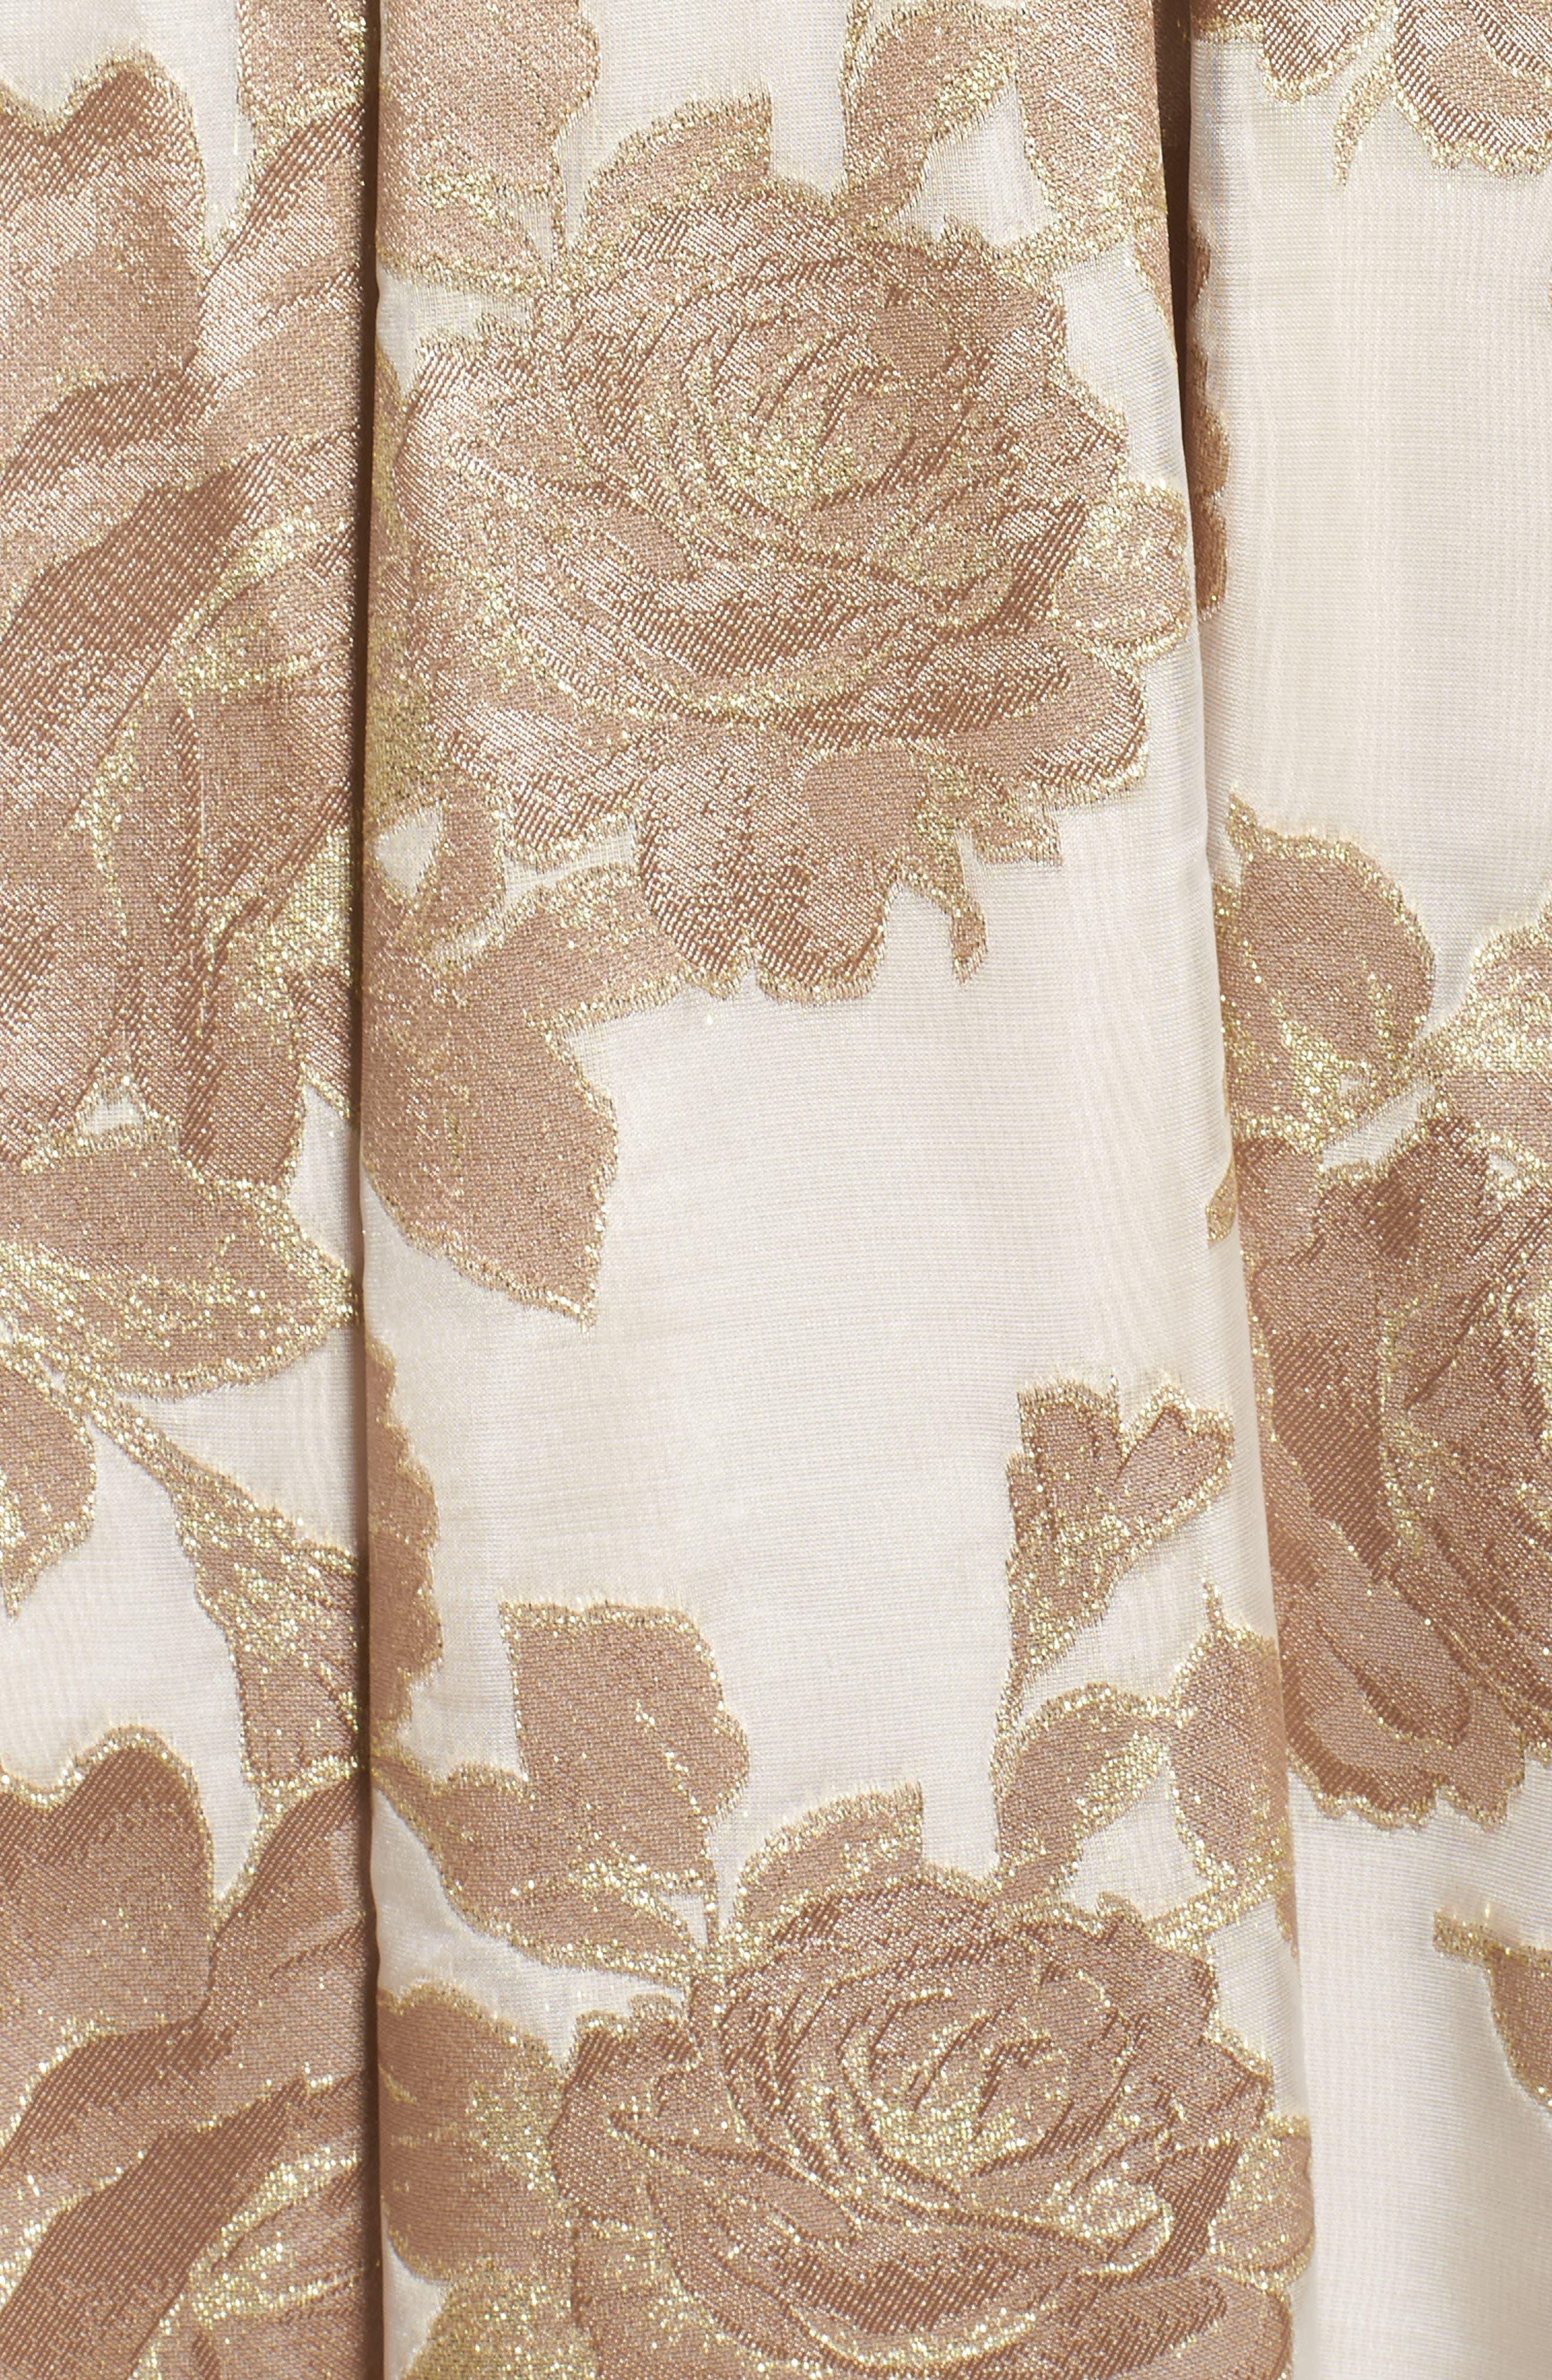 Embellished Floral Jacquard Fit & Flare Gown,                             Alternate thumbnail 5, color,                             710